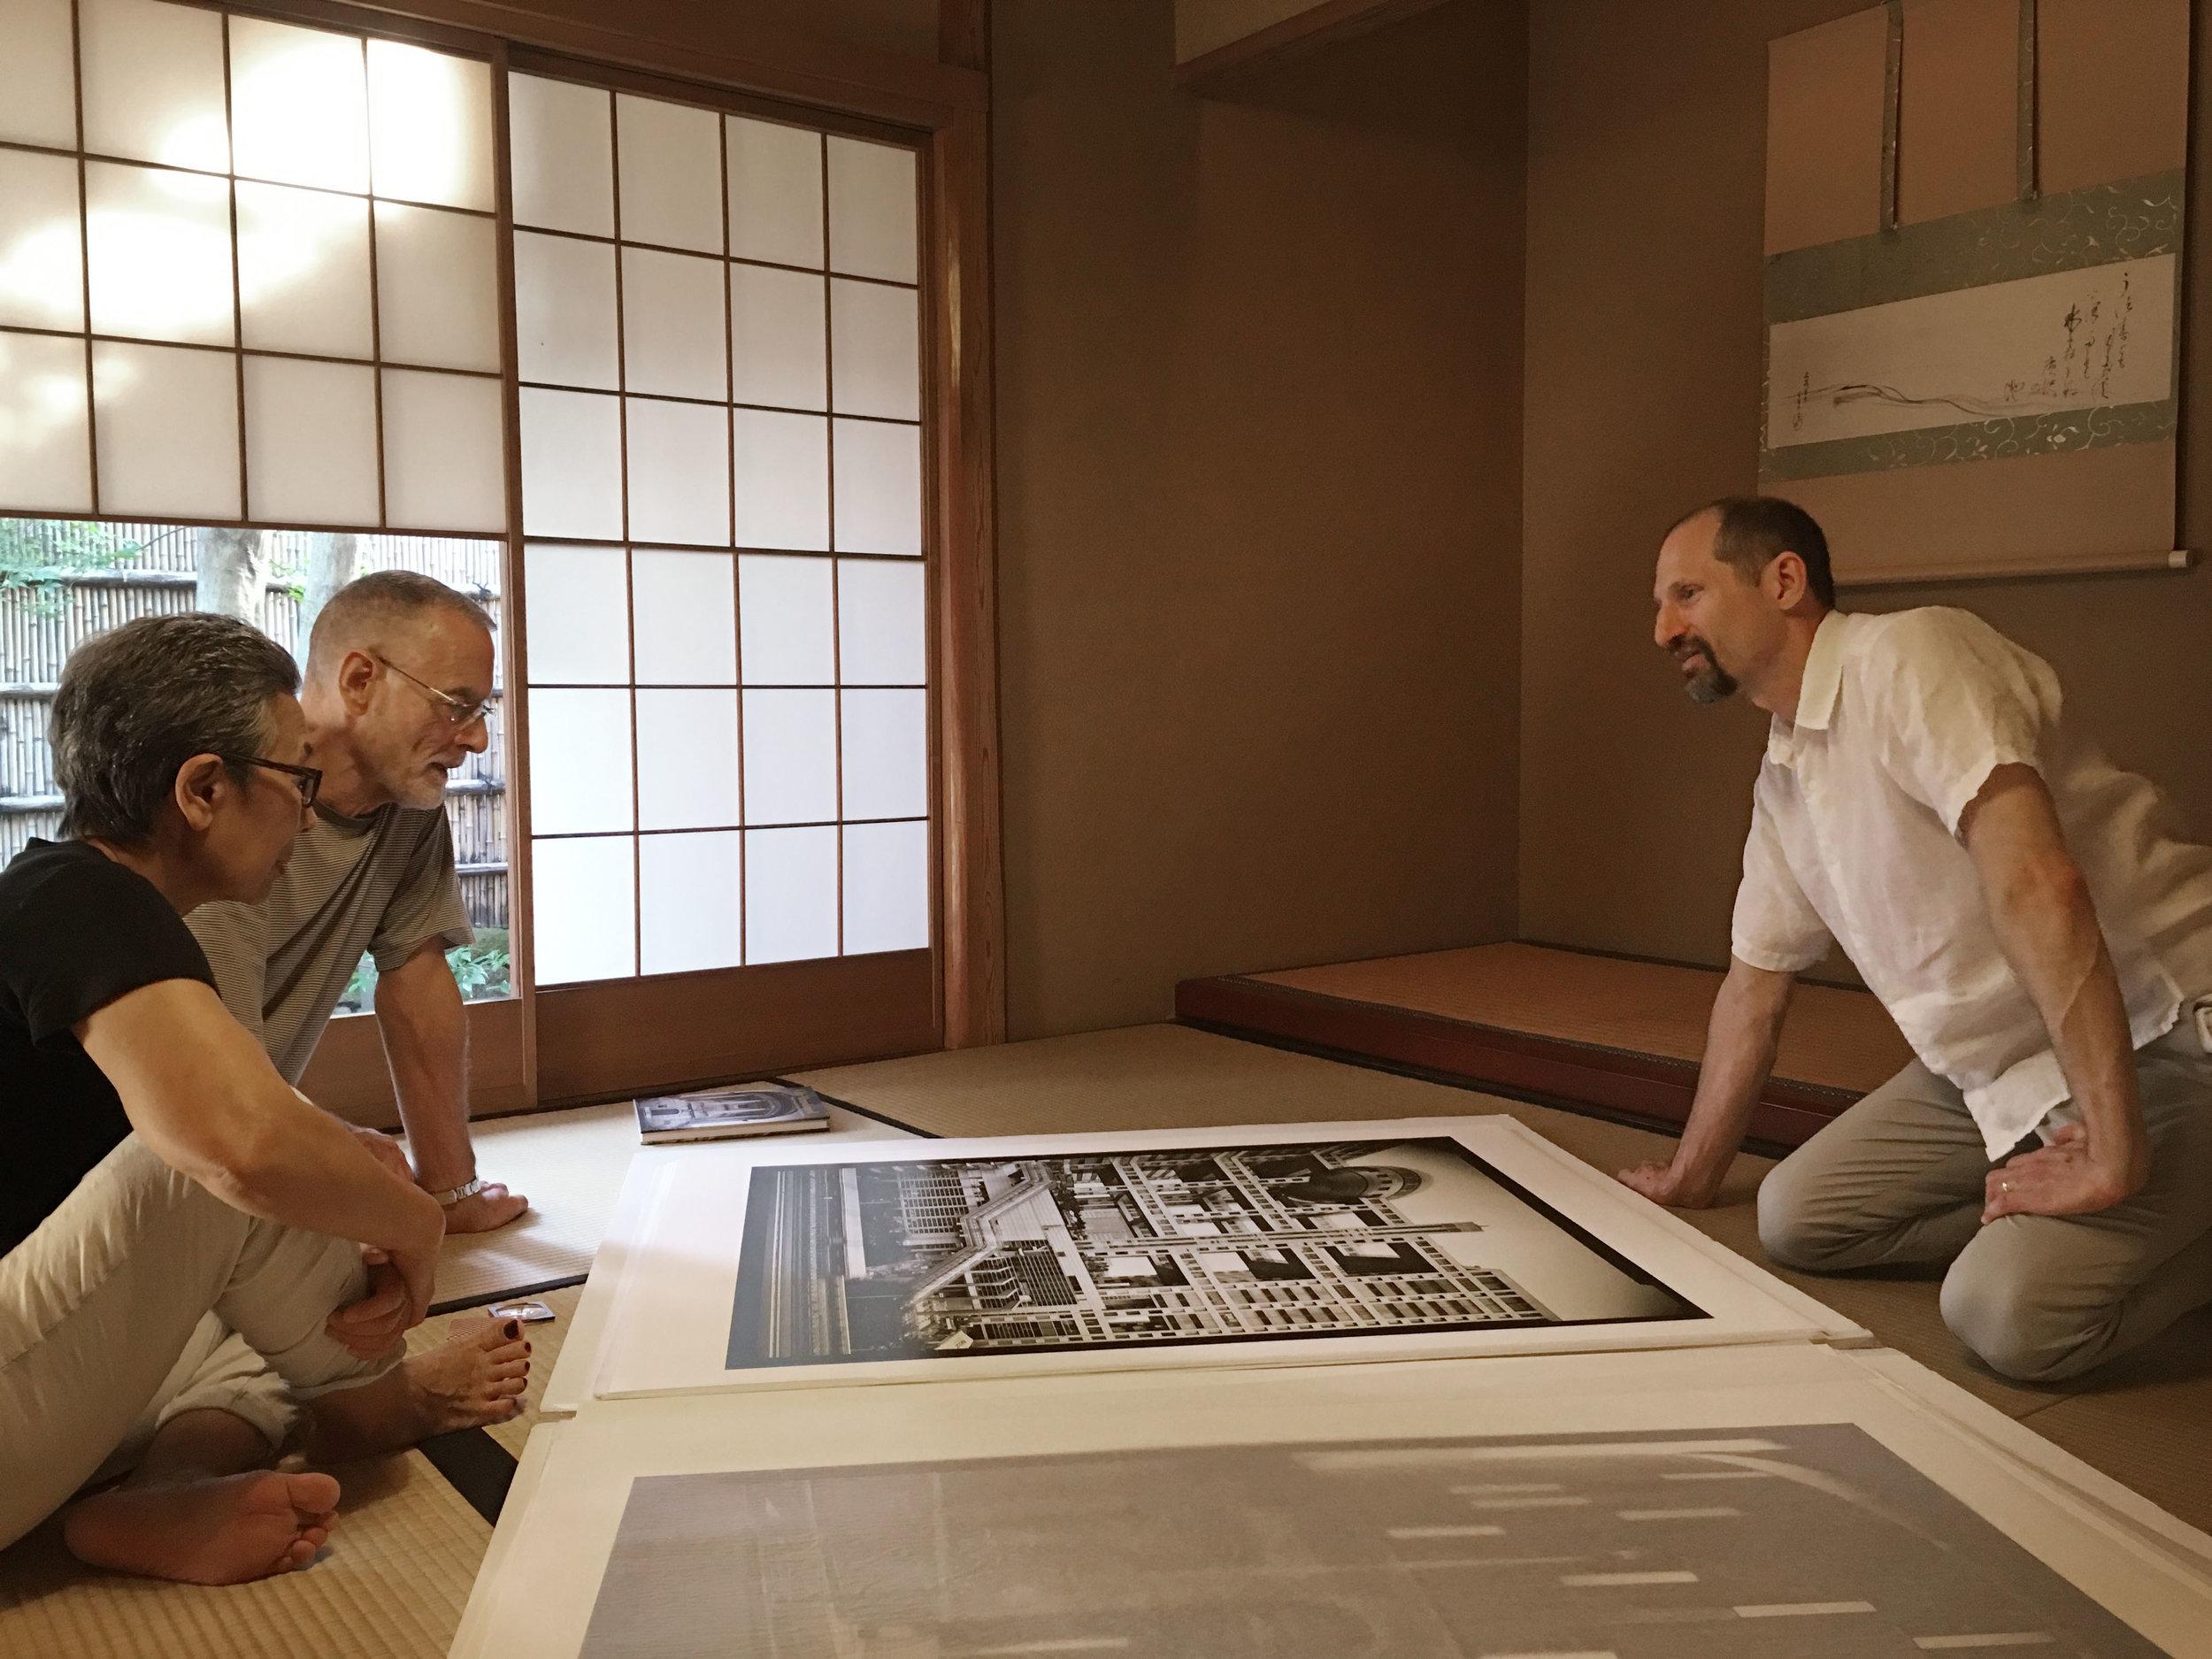 With architectural historian David Stewart and his wife Toshiko, Tokyo, 2016. Photo by Kaori Ikeuchi